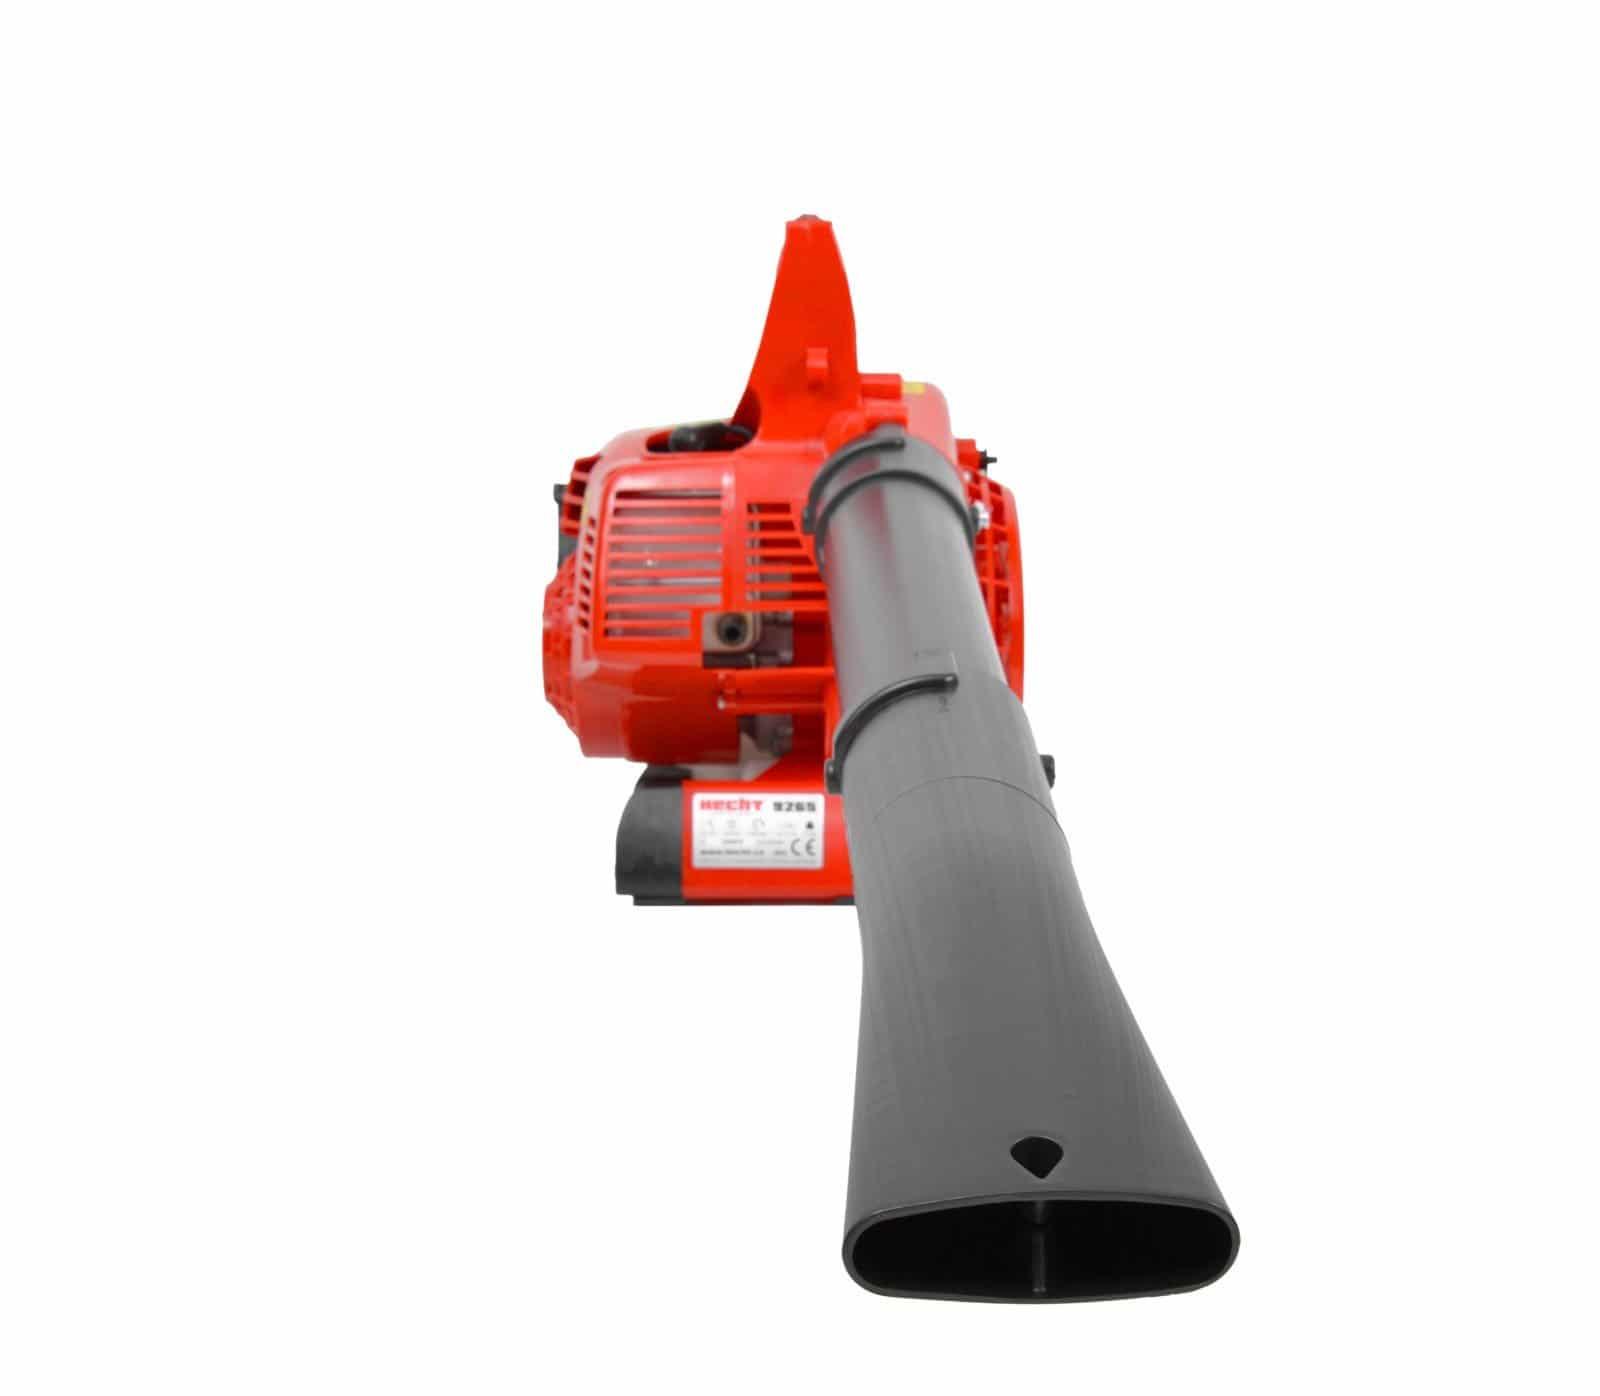 Soprador / Aspirador gasolina HCT B9259